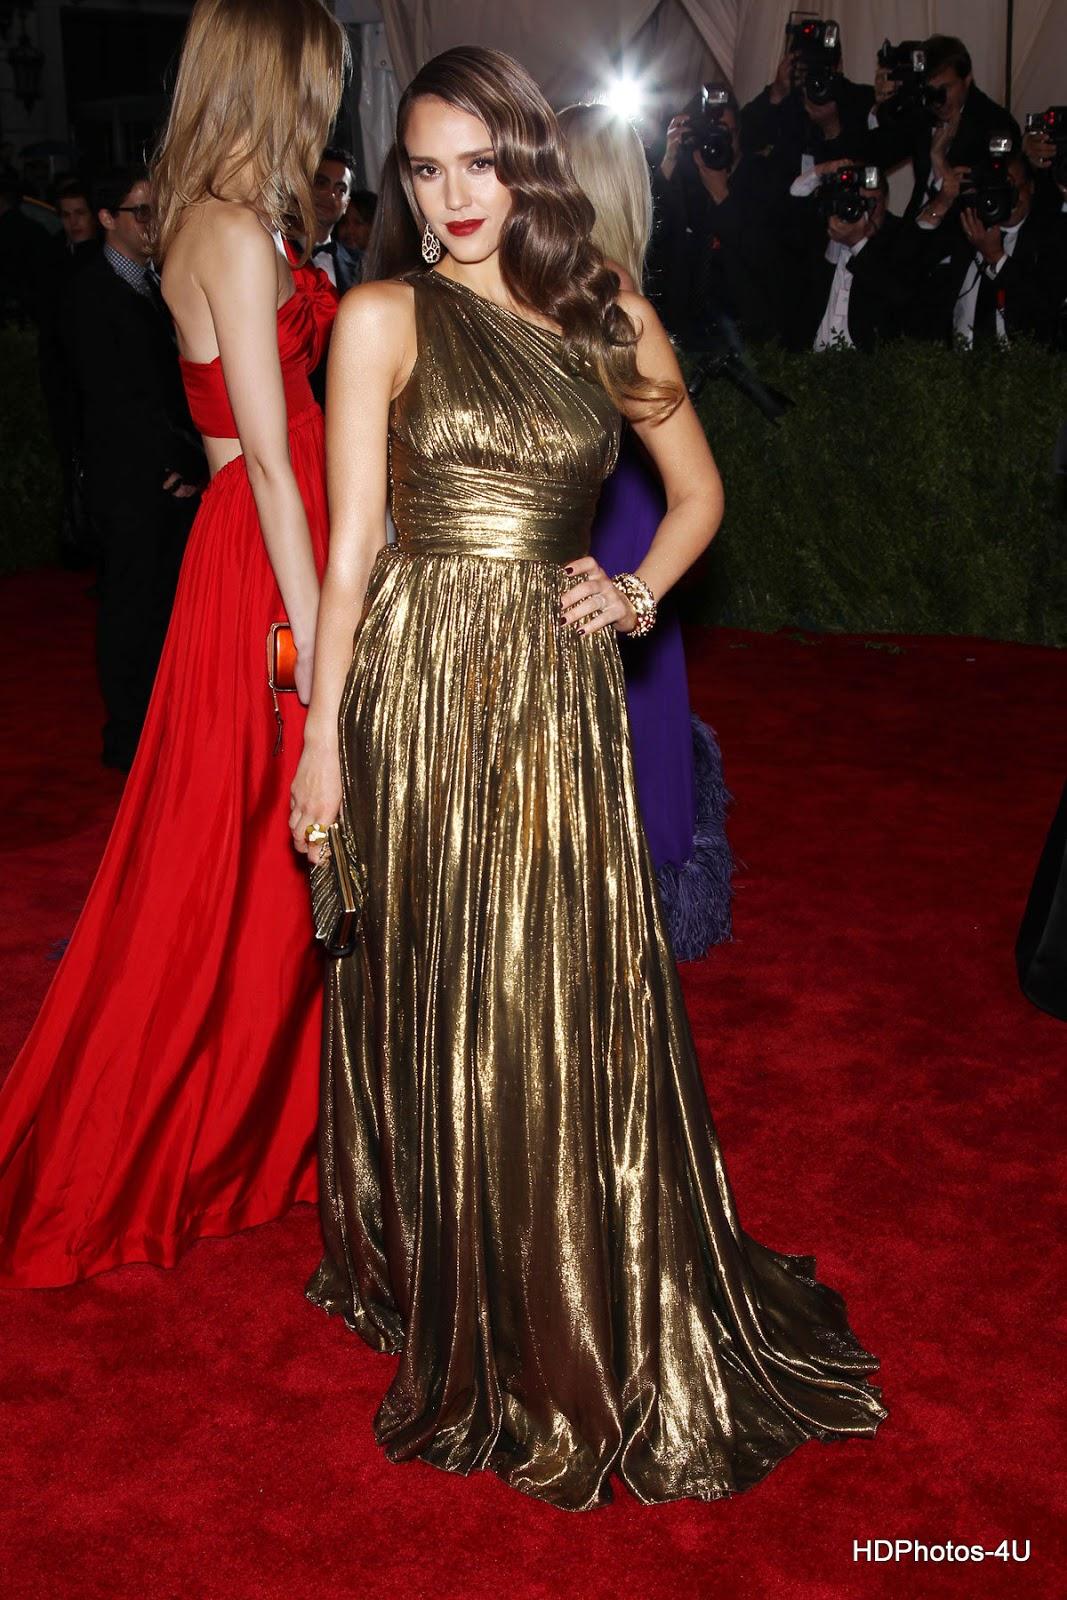 Full HQ Photos of Jessica Alba at Metropolitan Museum of Art's Costume Gala 2012 in New York